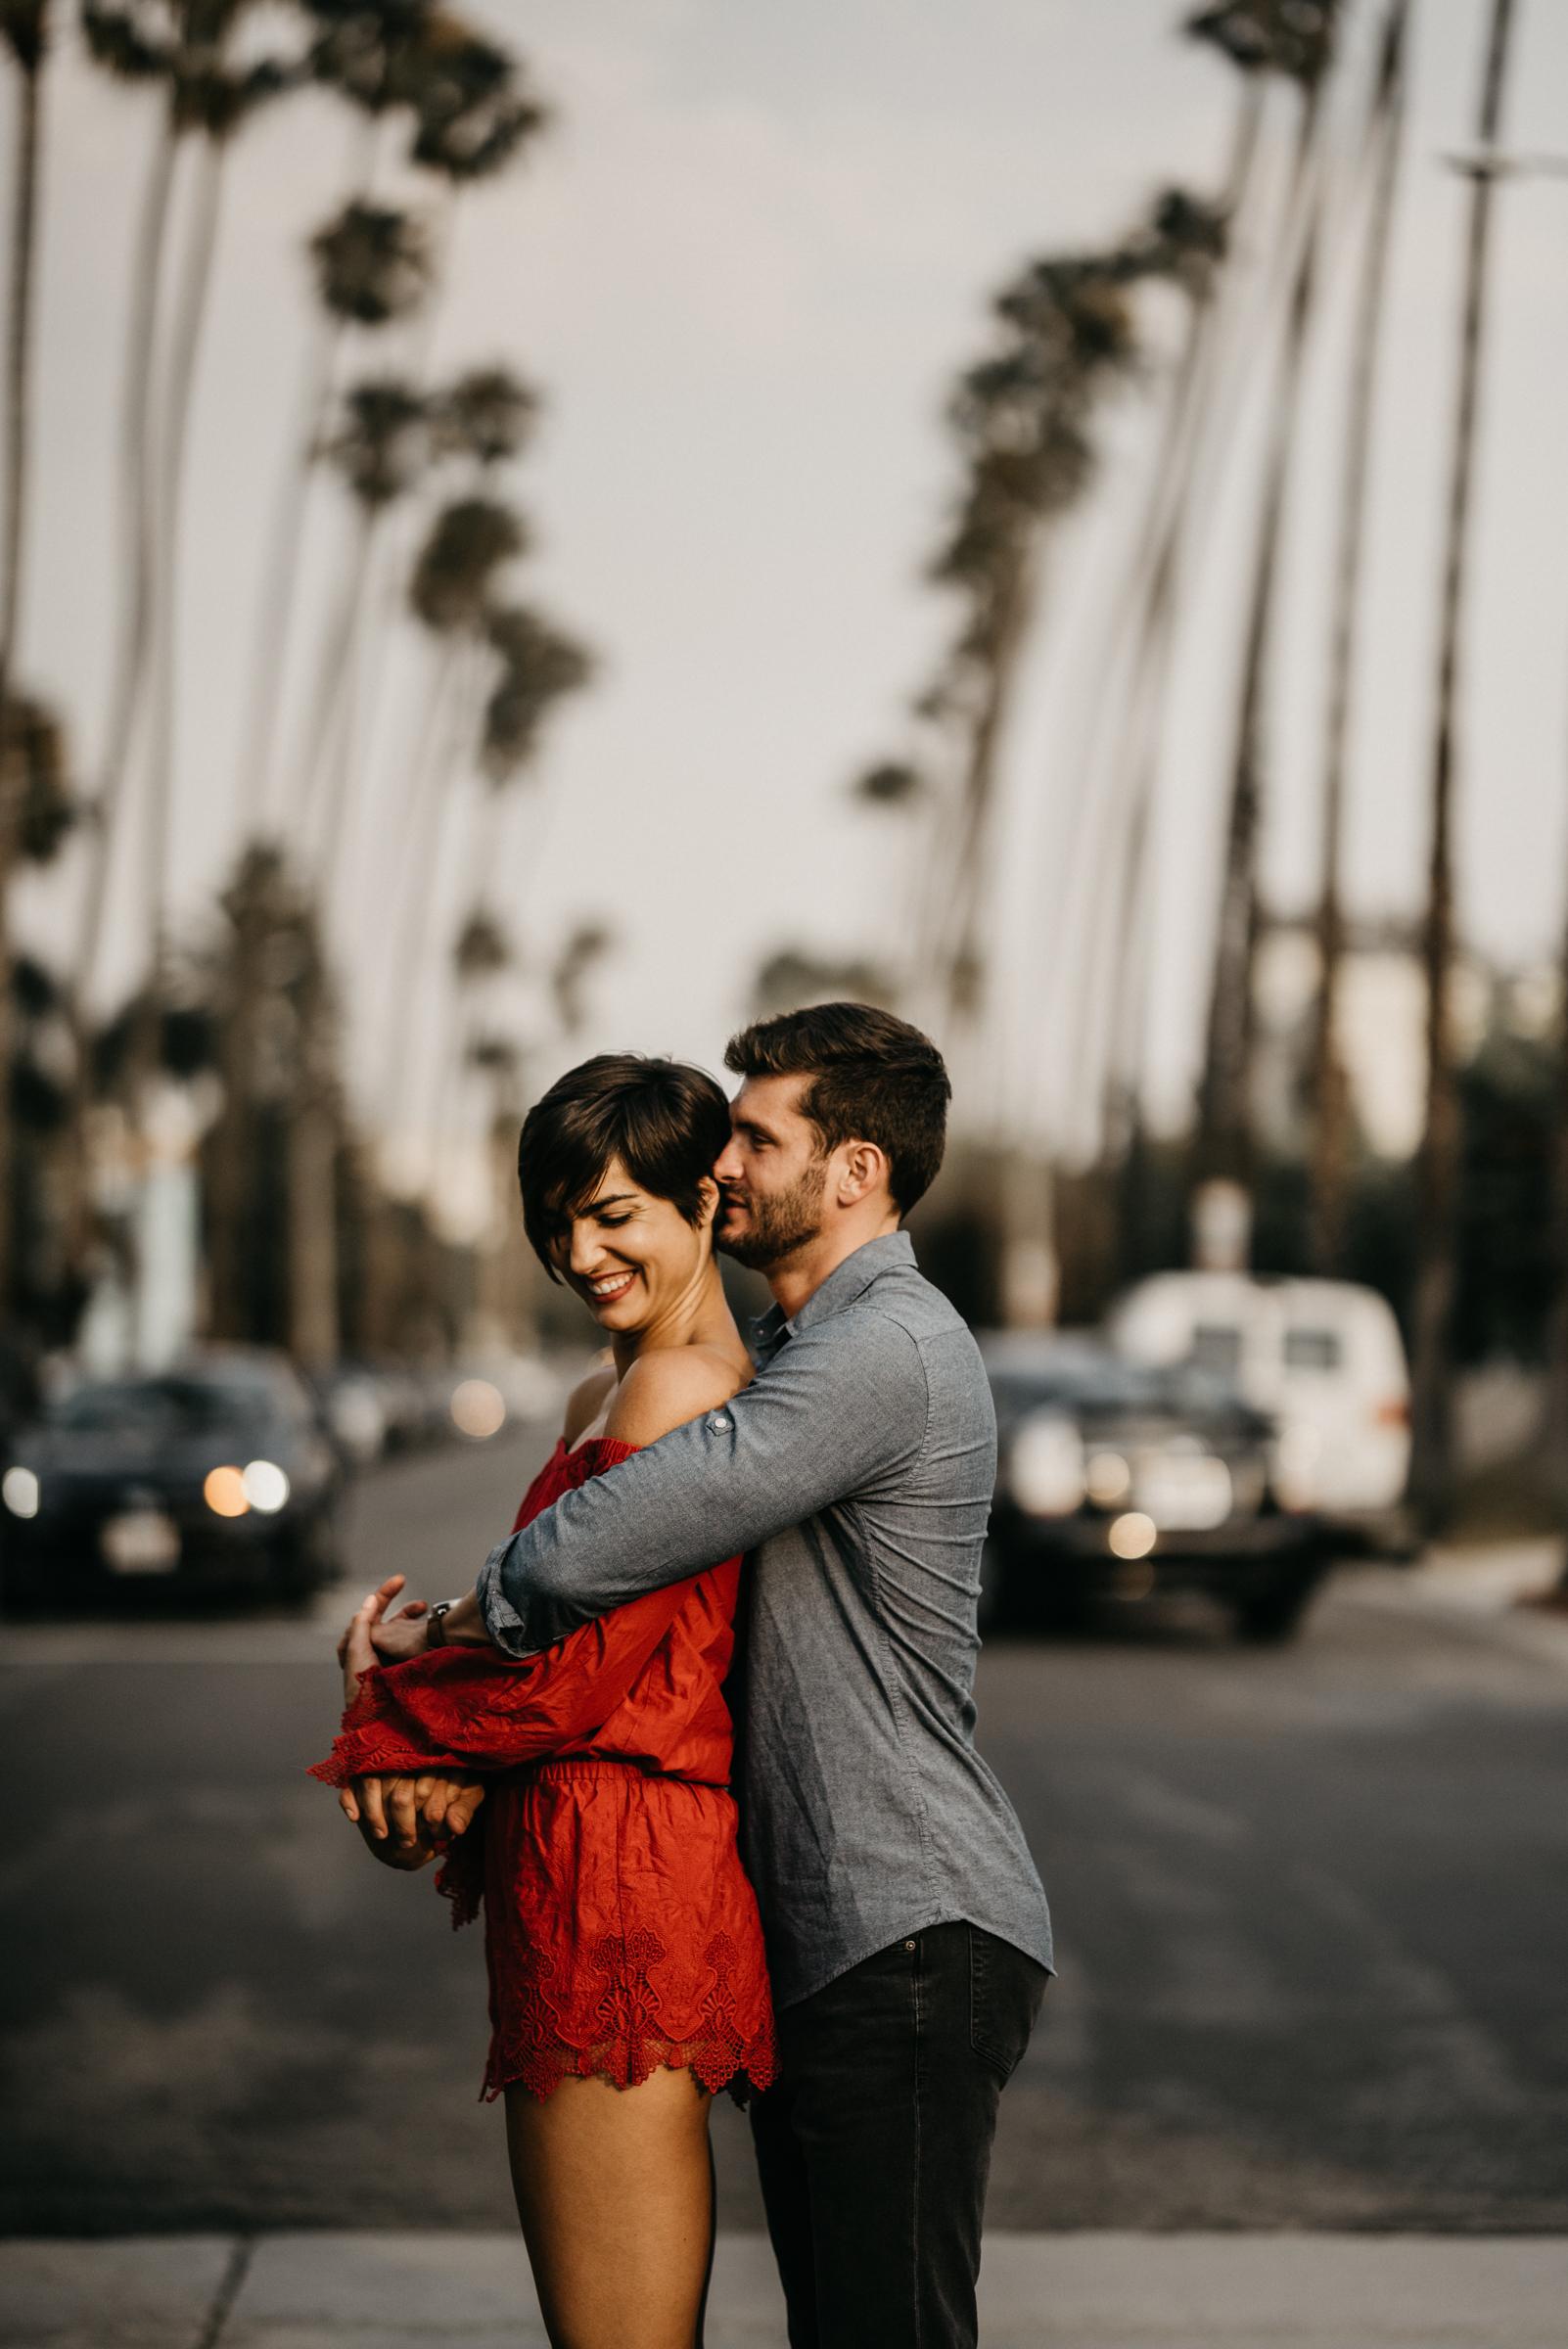 Isaiah + Taylor Photography - Santa Monica Engagement Session, Los Angeles Wedding Photographer-005.jpg